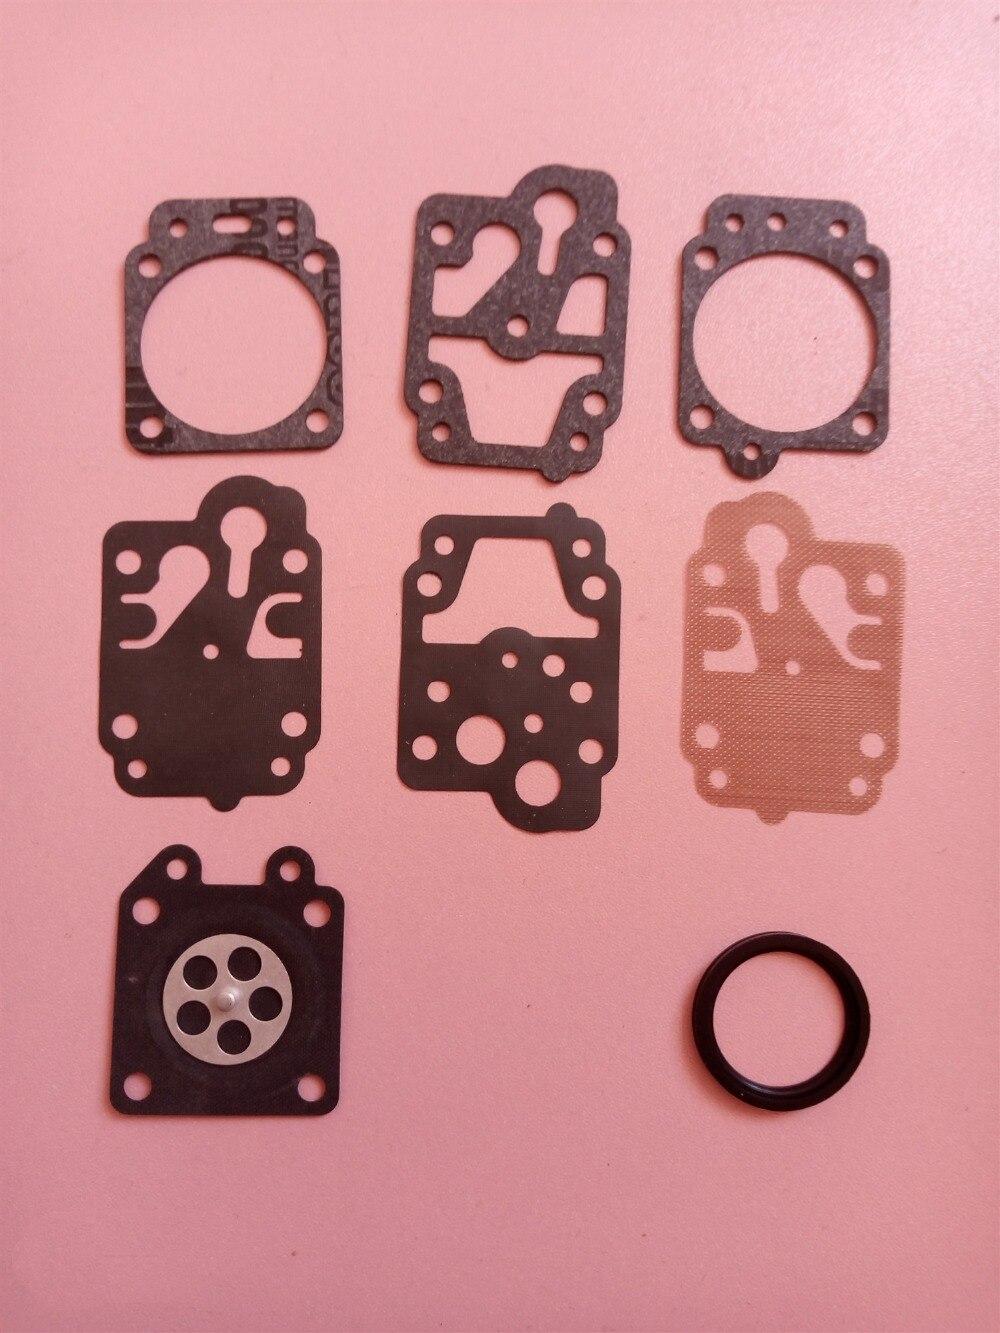 Carburetor Carb Repair Kit Rebuild Kit Replacement For K10-WYB For 142R SRM-260 SRM-261 GX25 GX35 HHB25 CHAINSAW Trimmer